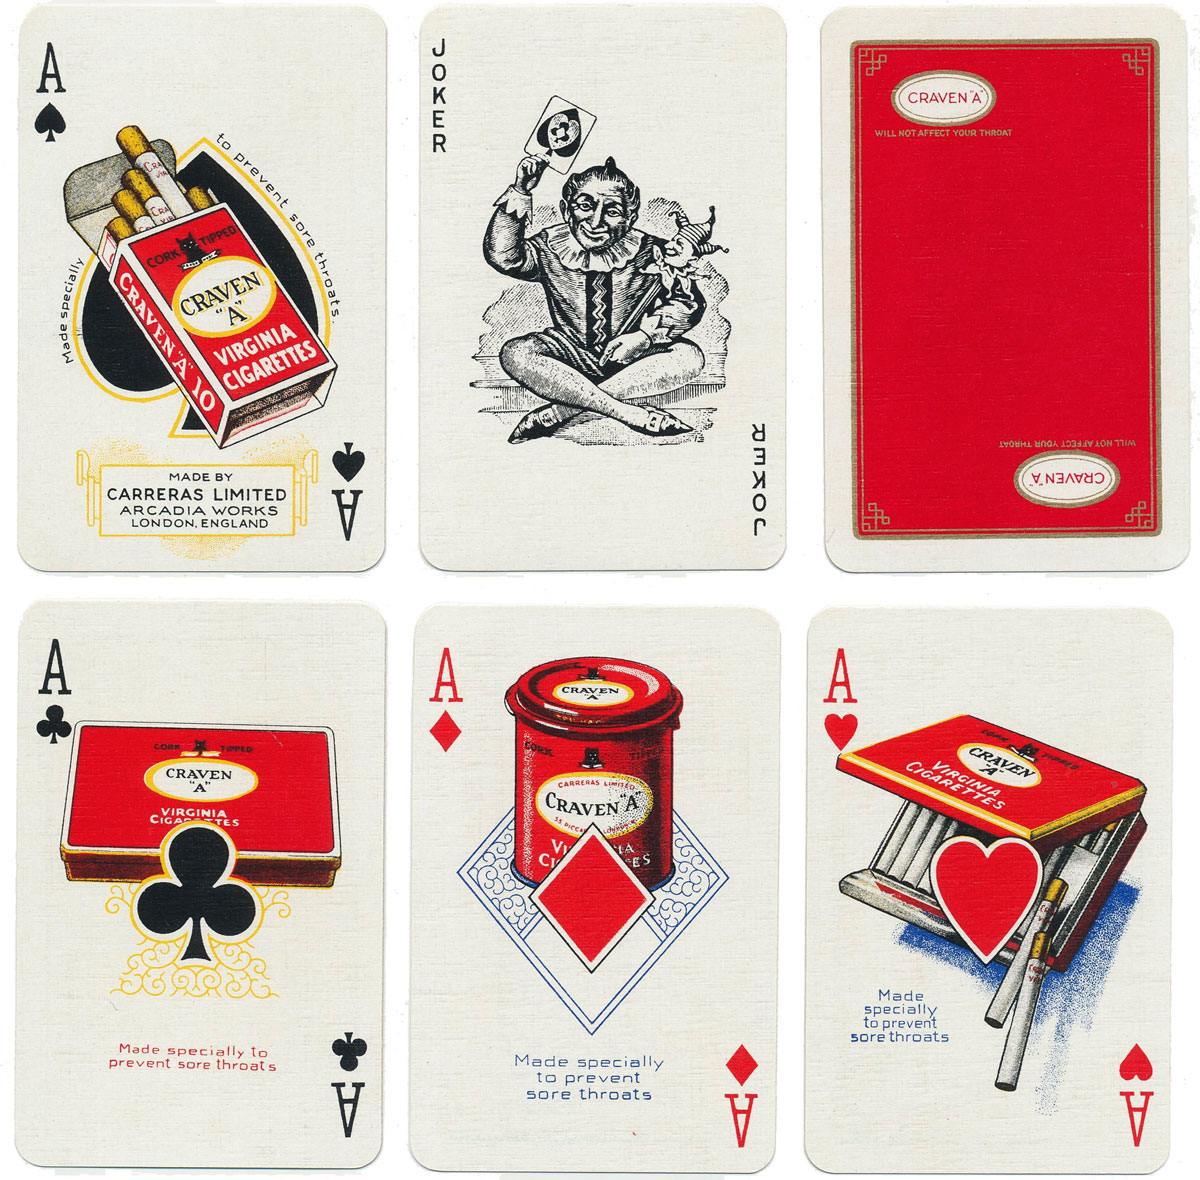 deck advertising Craven A Cigarettes by De La Rue, mid-to-late 1940s